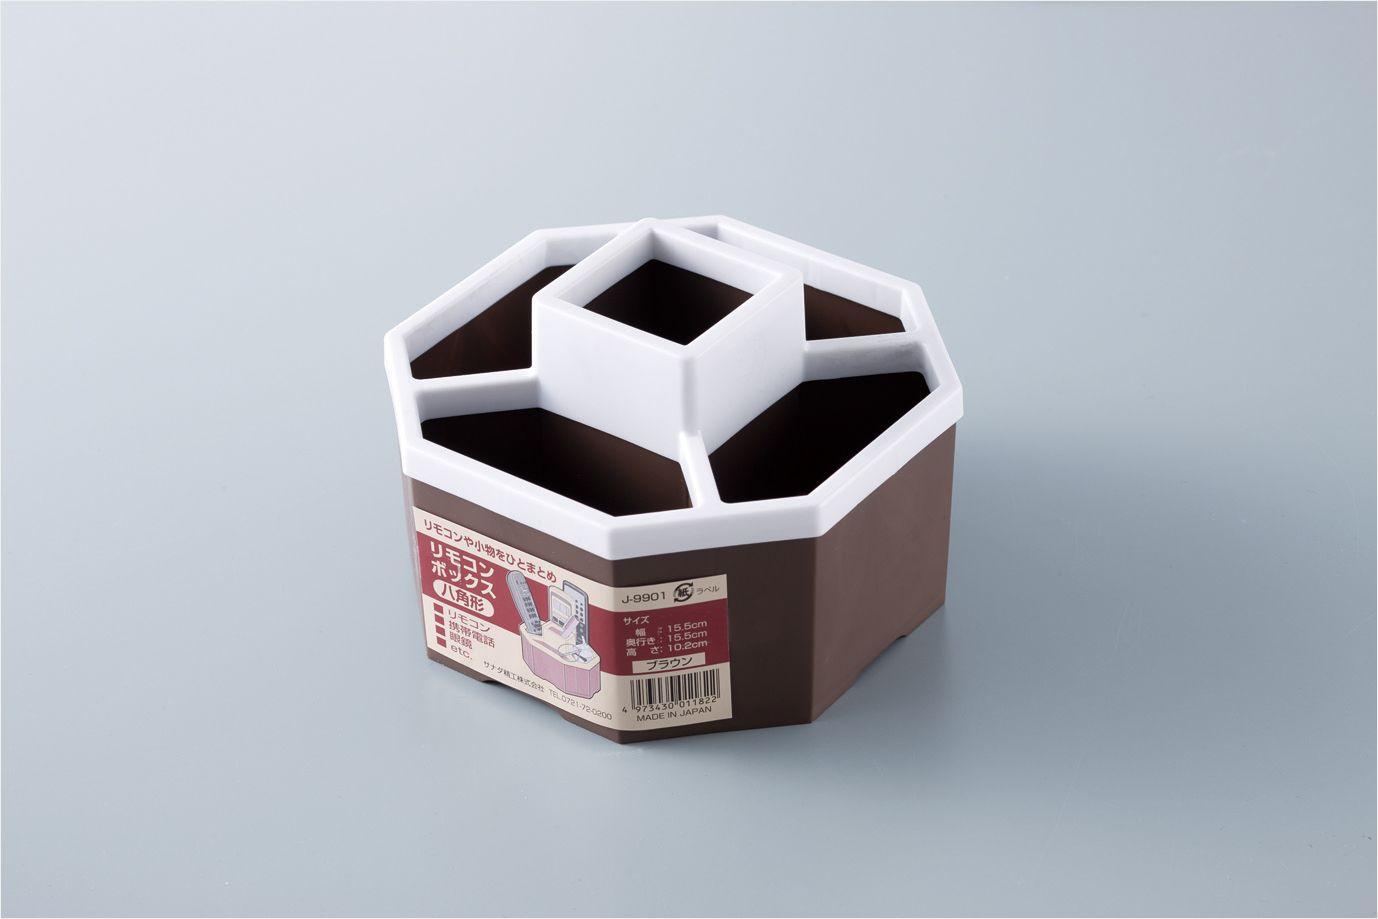 sanada日本遥控器收纳盒